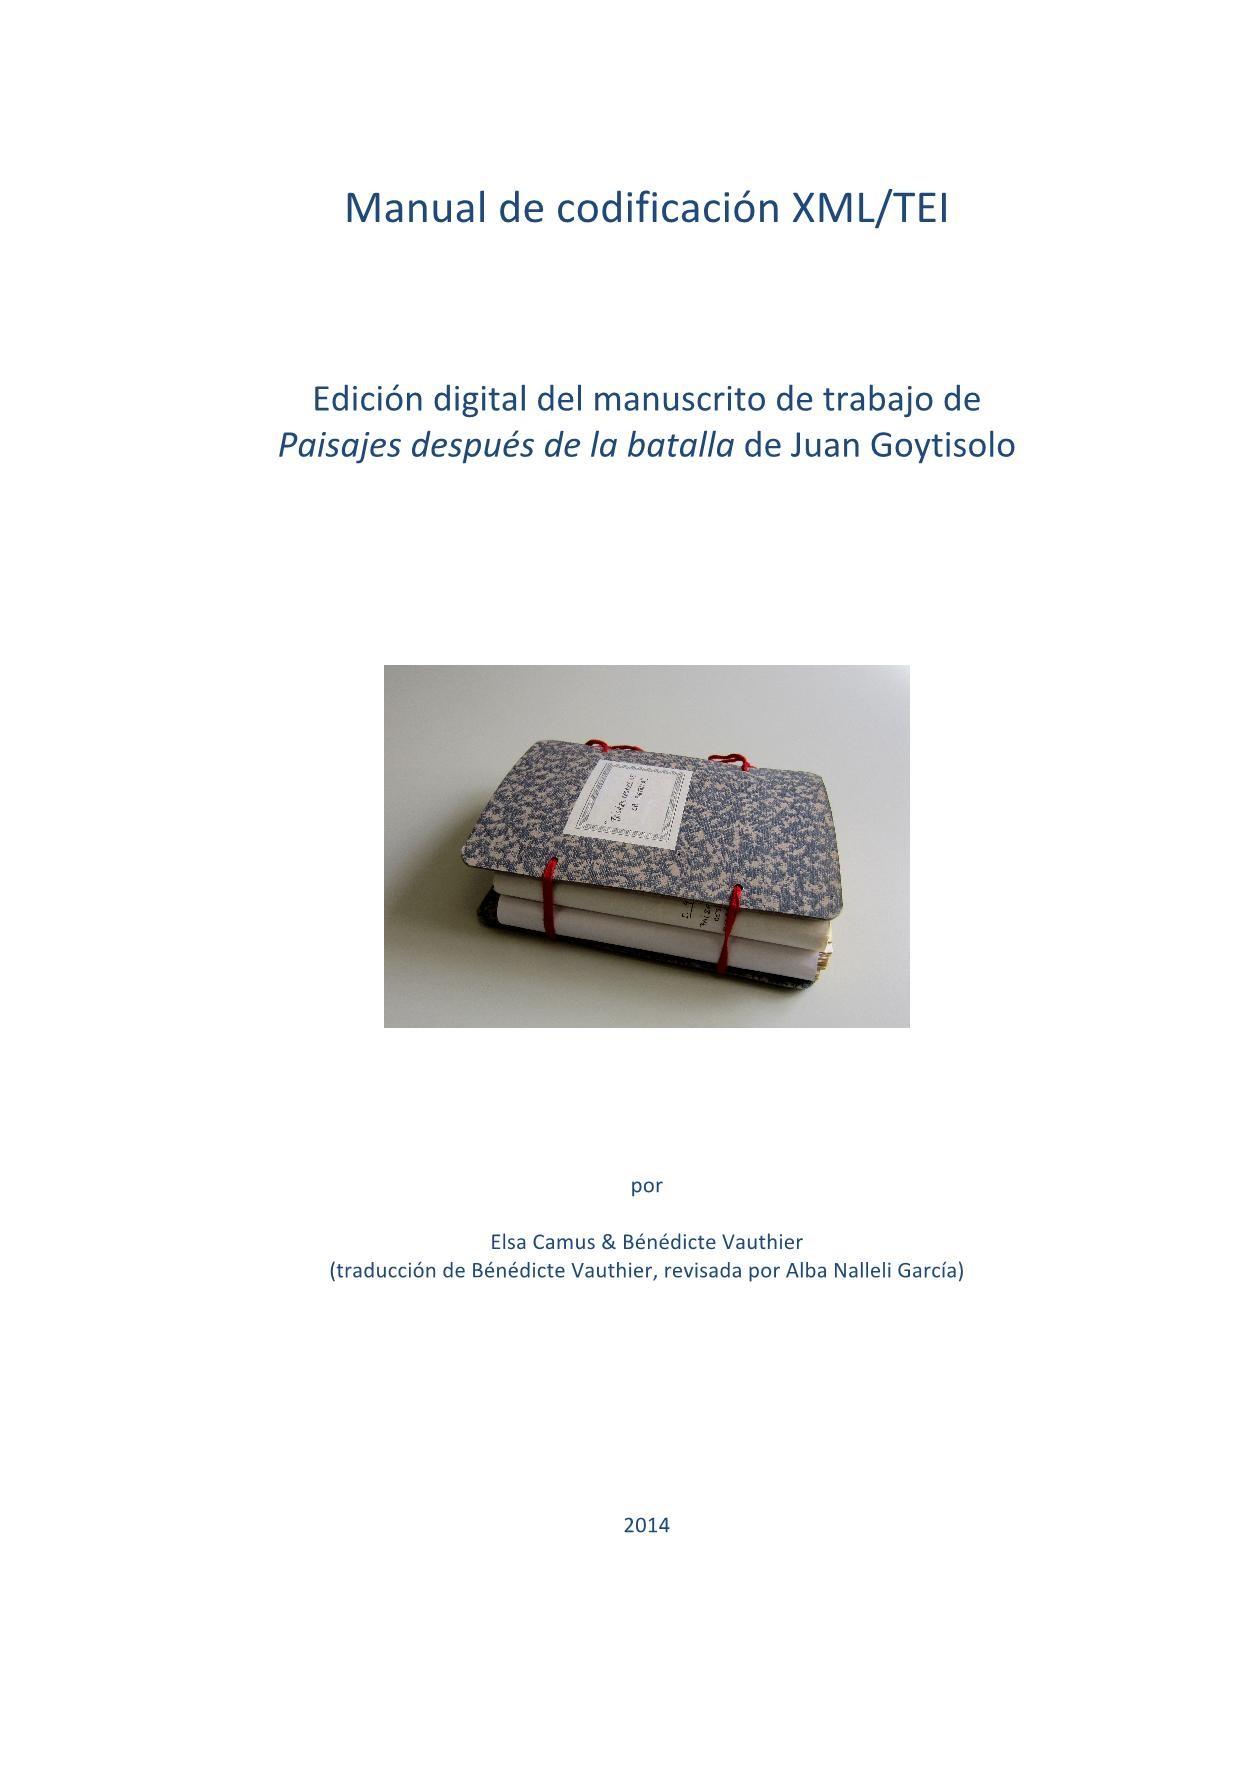 Manual de codificacion tei_version espanola | fliphtml5.